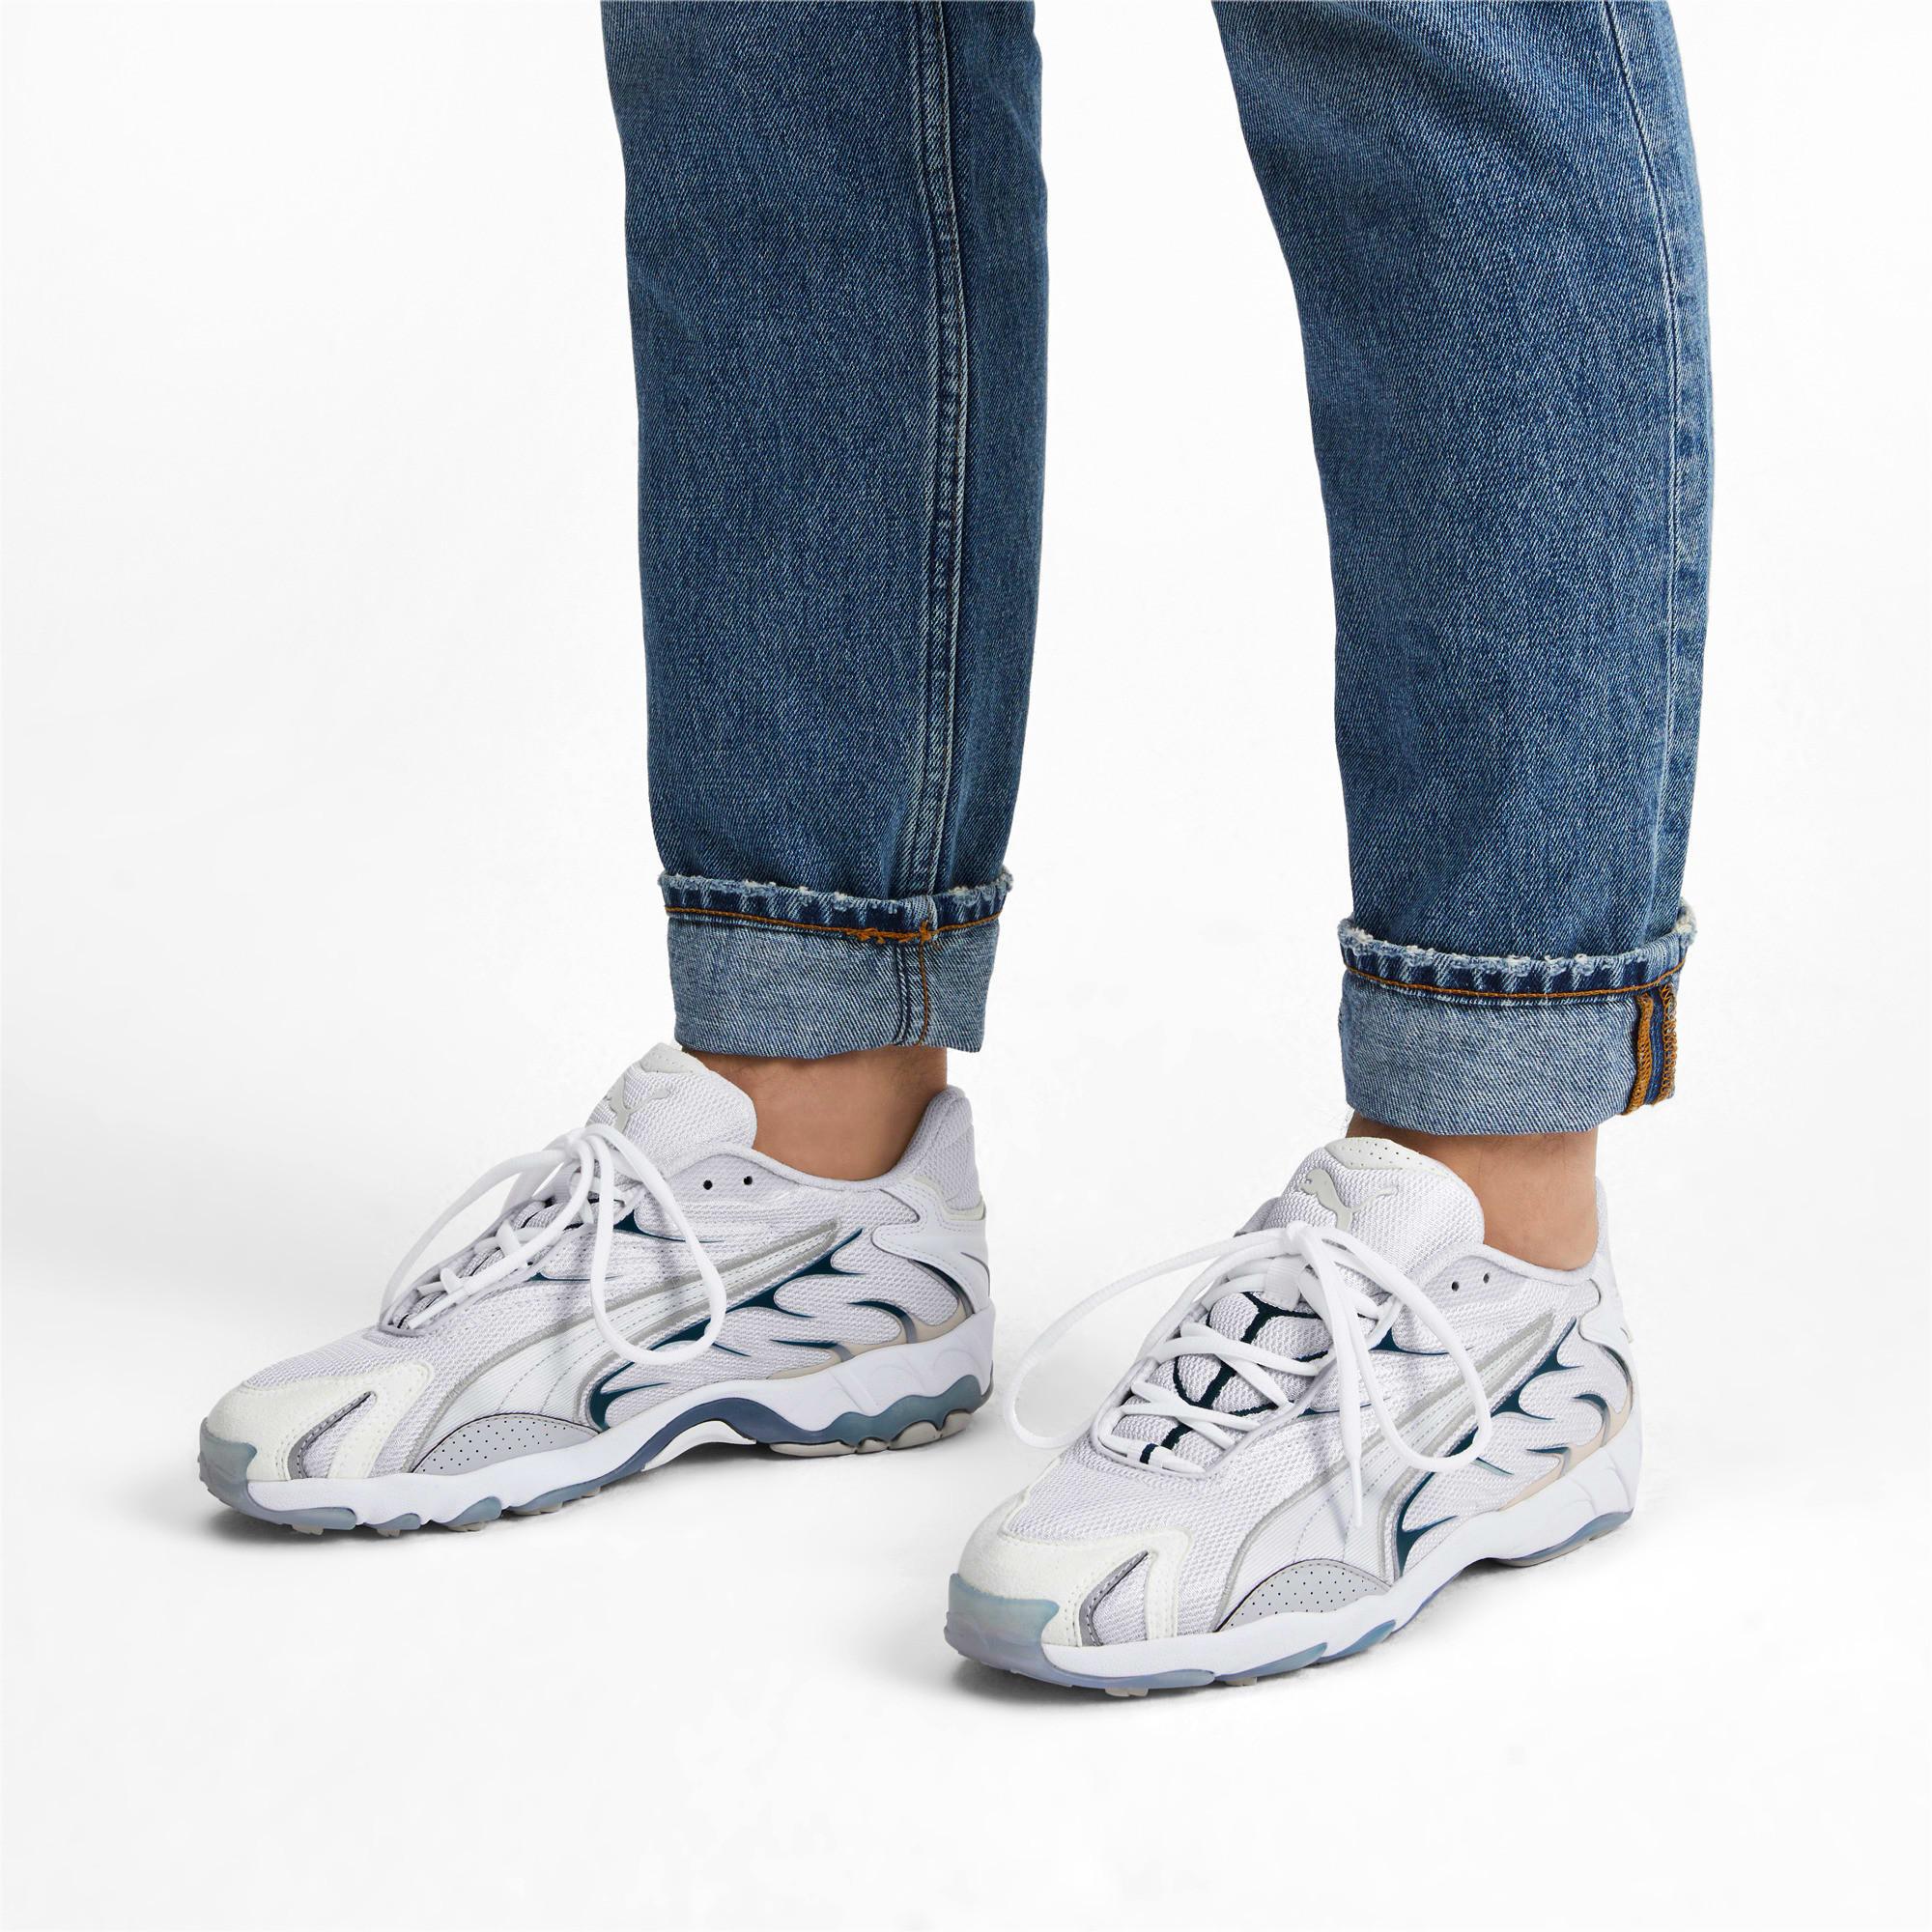 Thumbnail 2 of Inhale Sneakers, Puma White-Gray Violet, medium